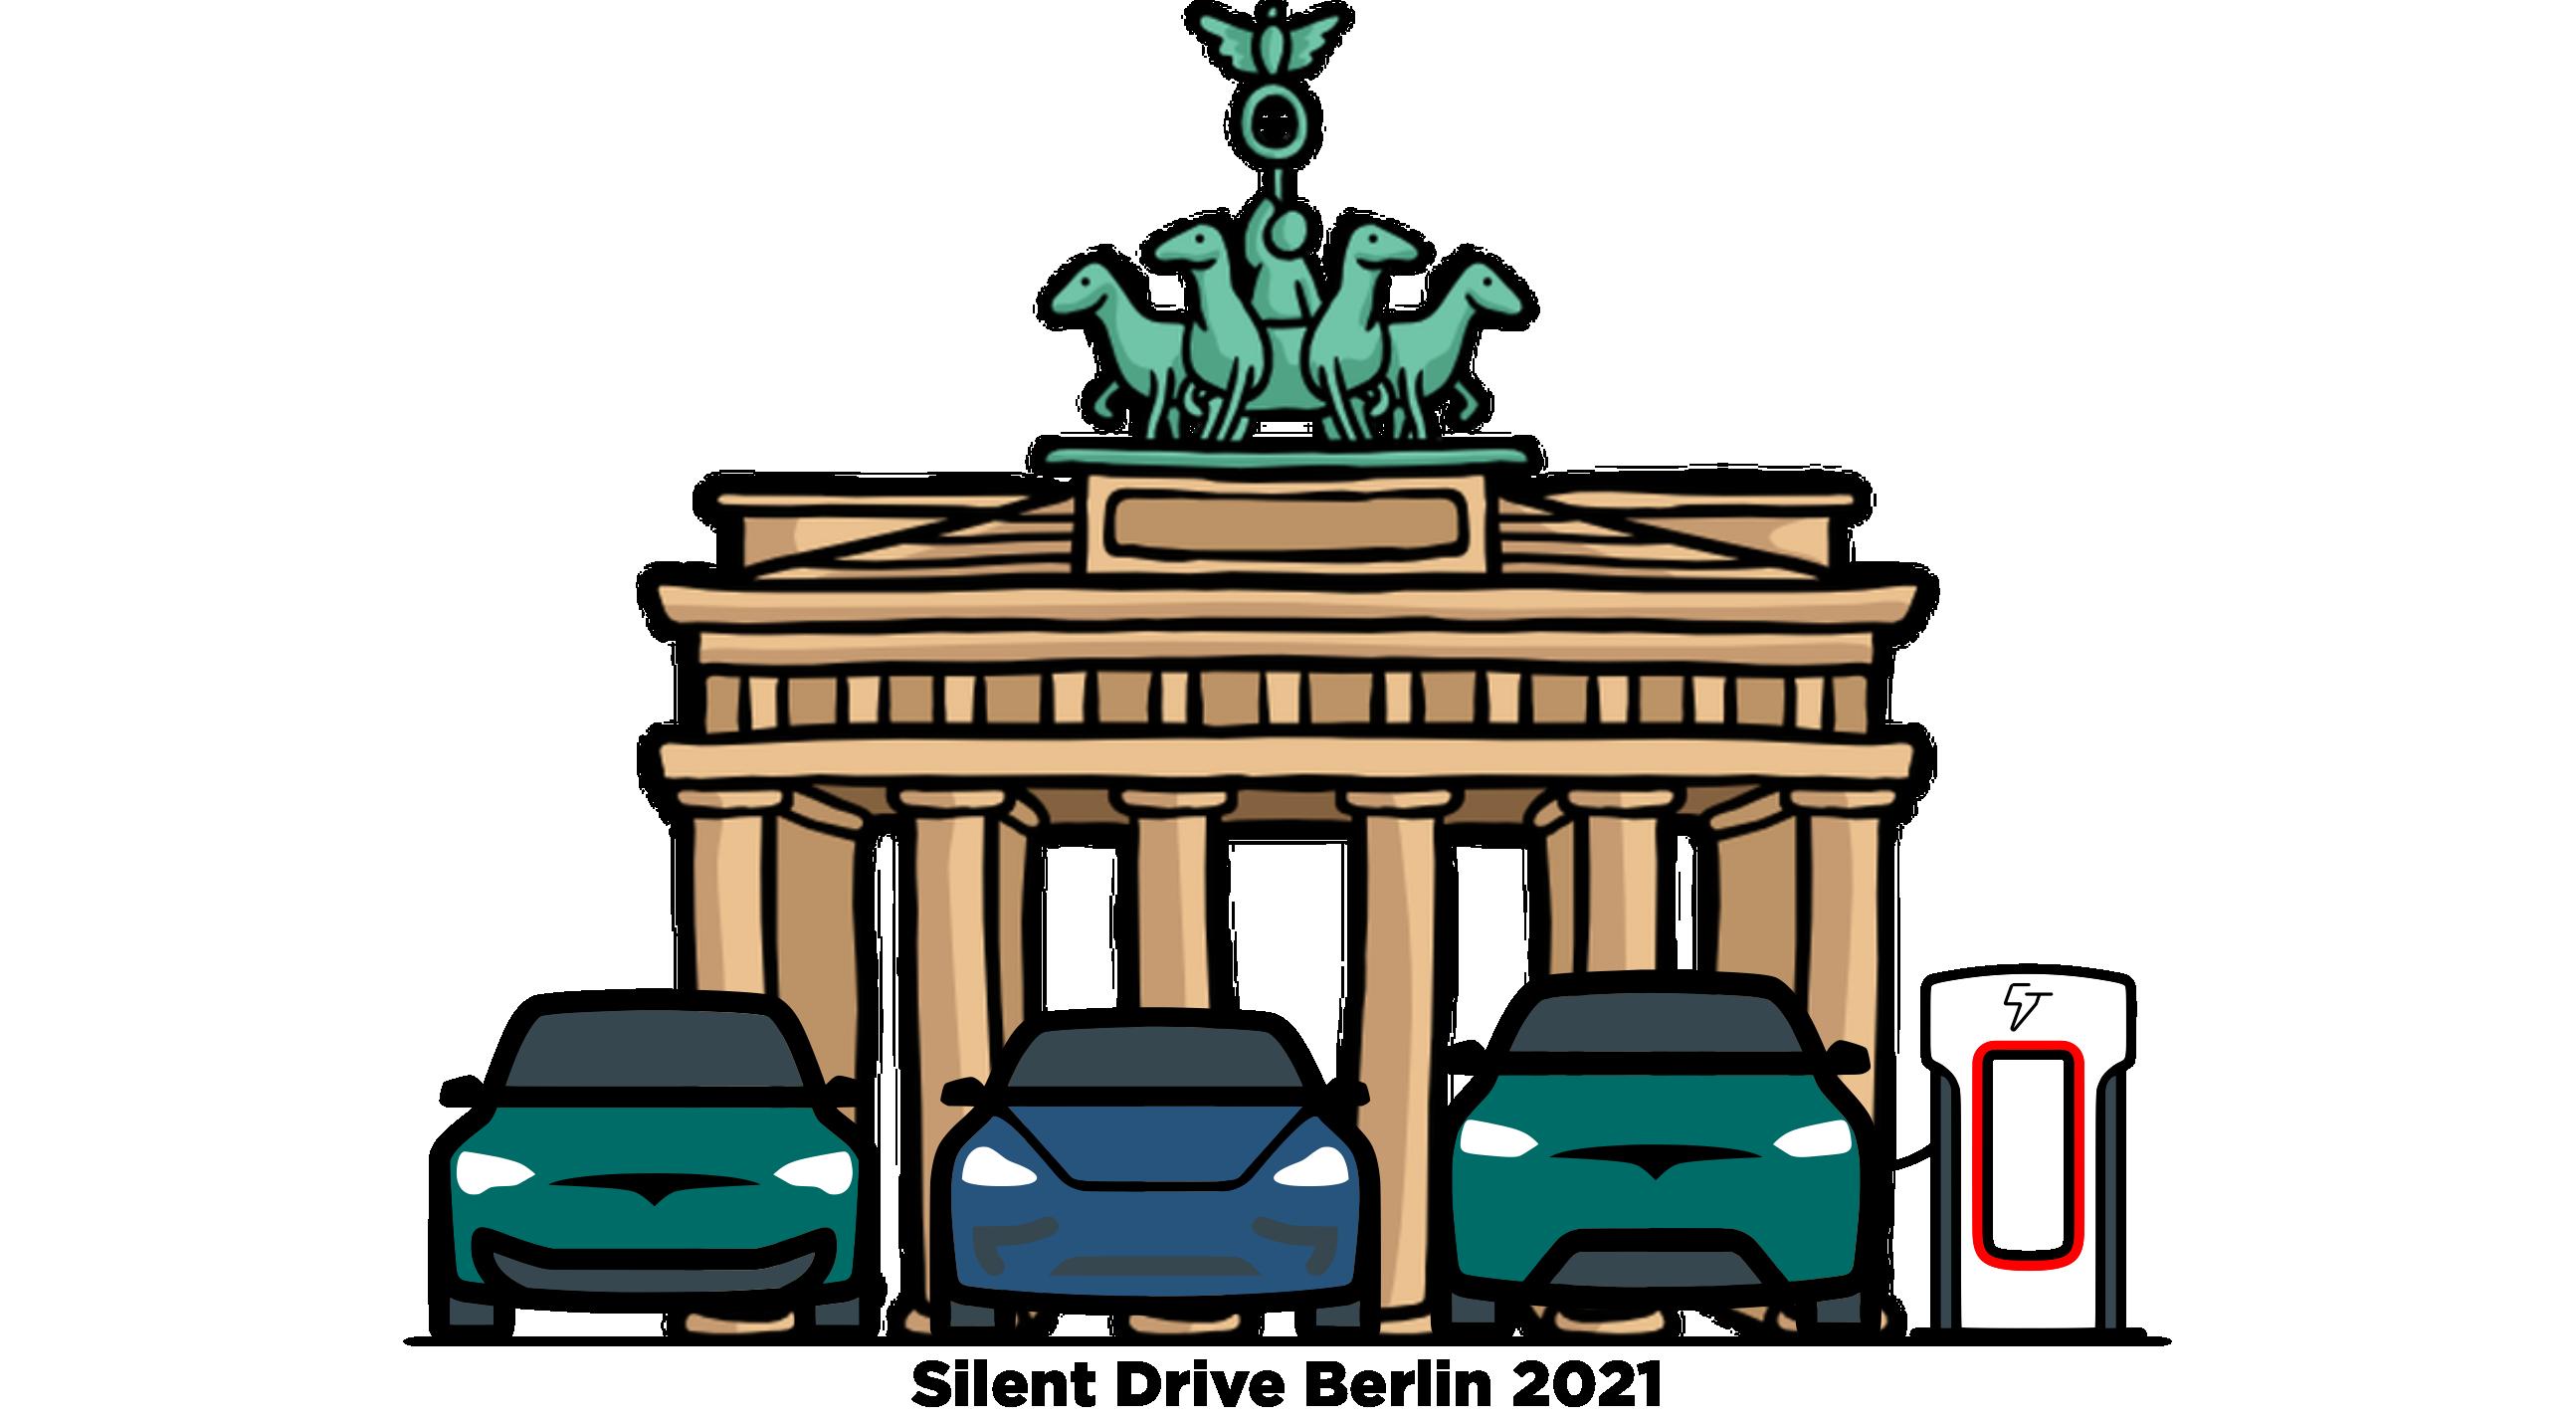 Silent Drive Berlin